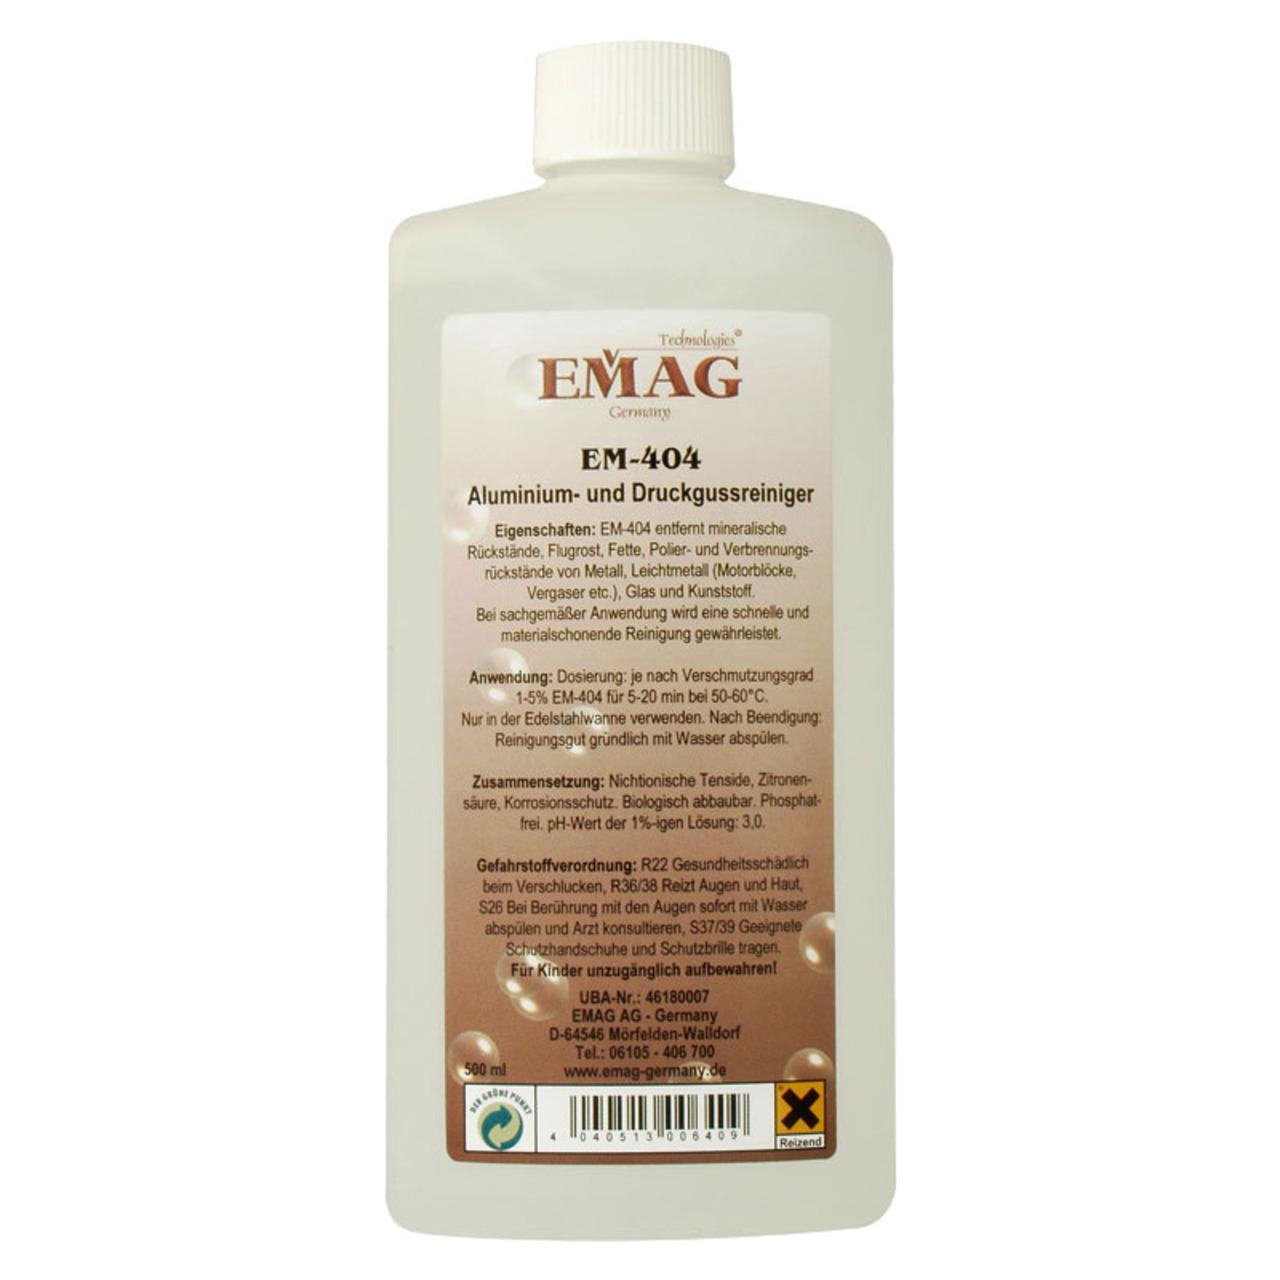 EMAG Aluminium- und Druckgussreiniger EM-404- 500 ml